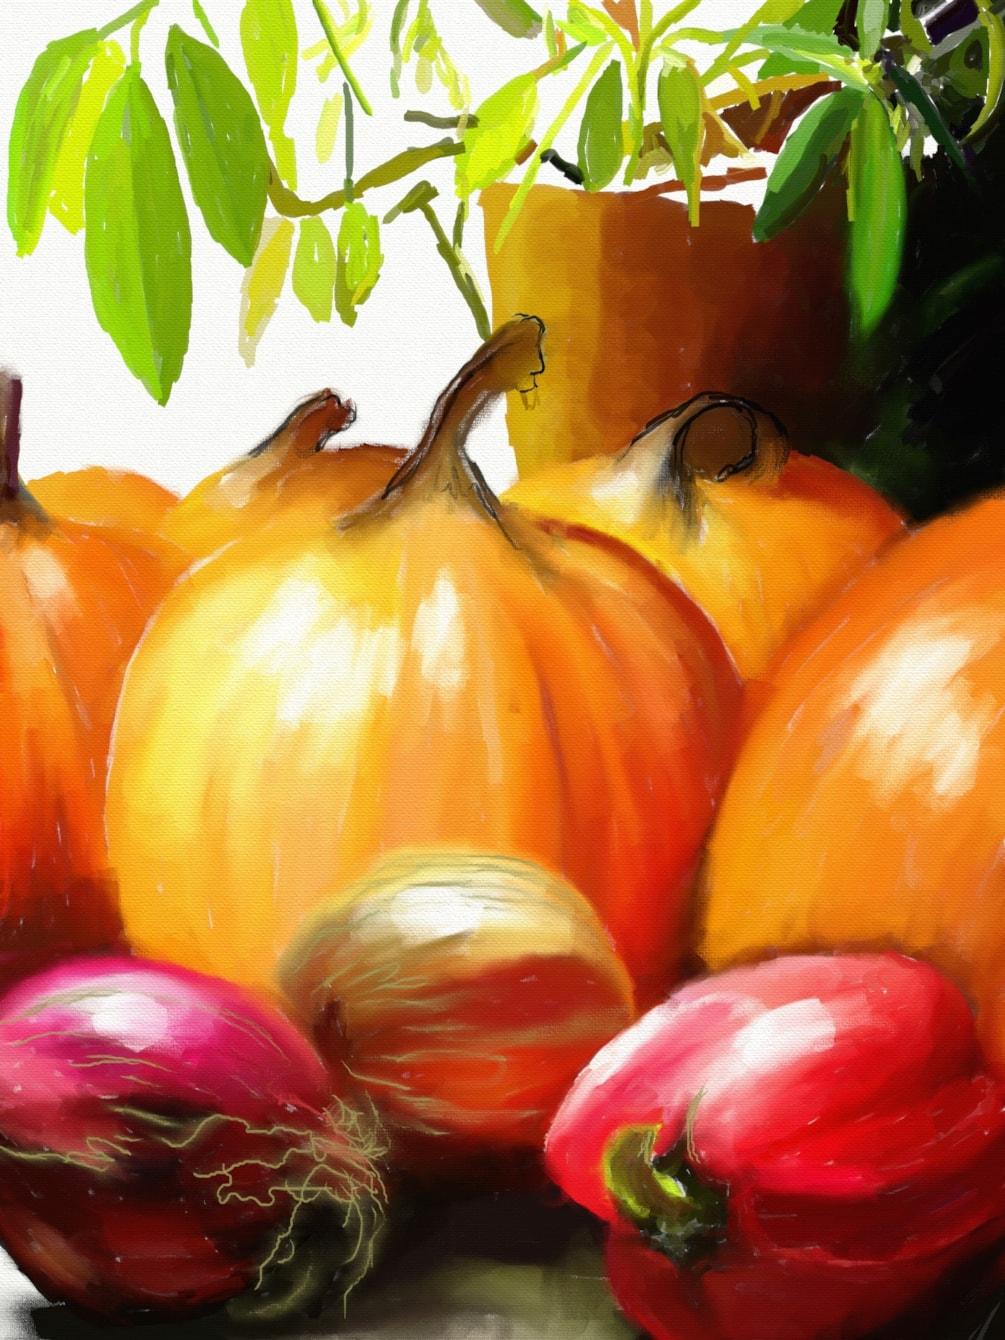 Onions & Pumpkins (9x12,150)